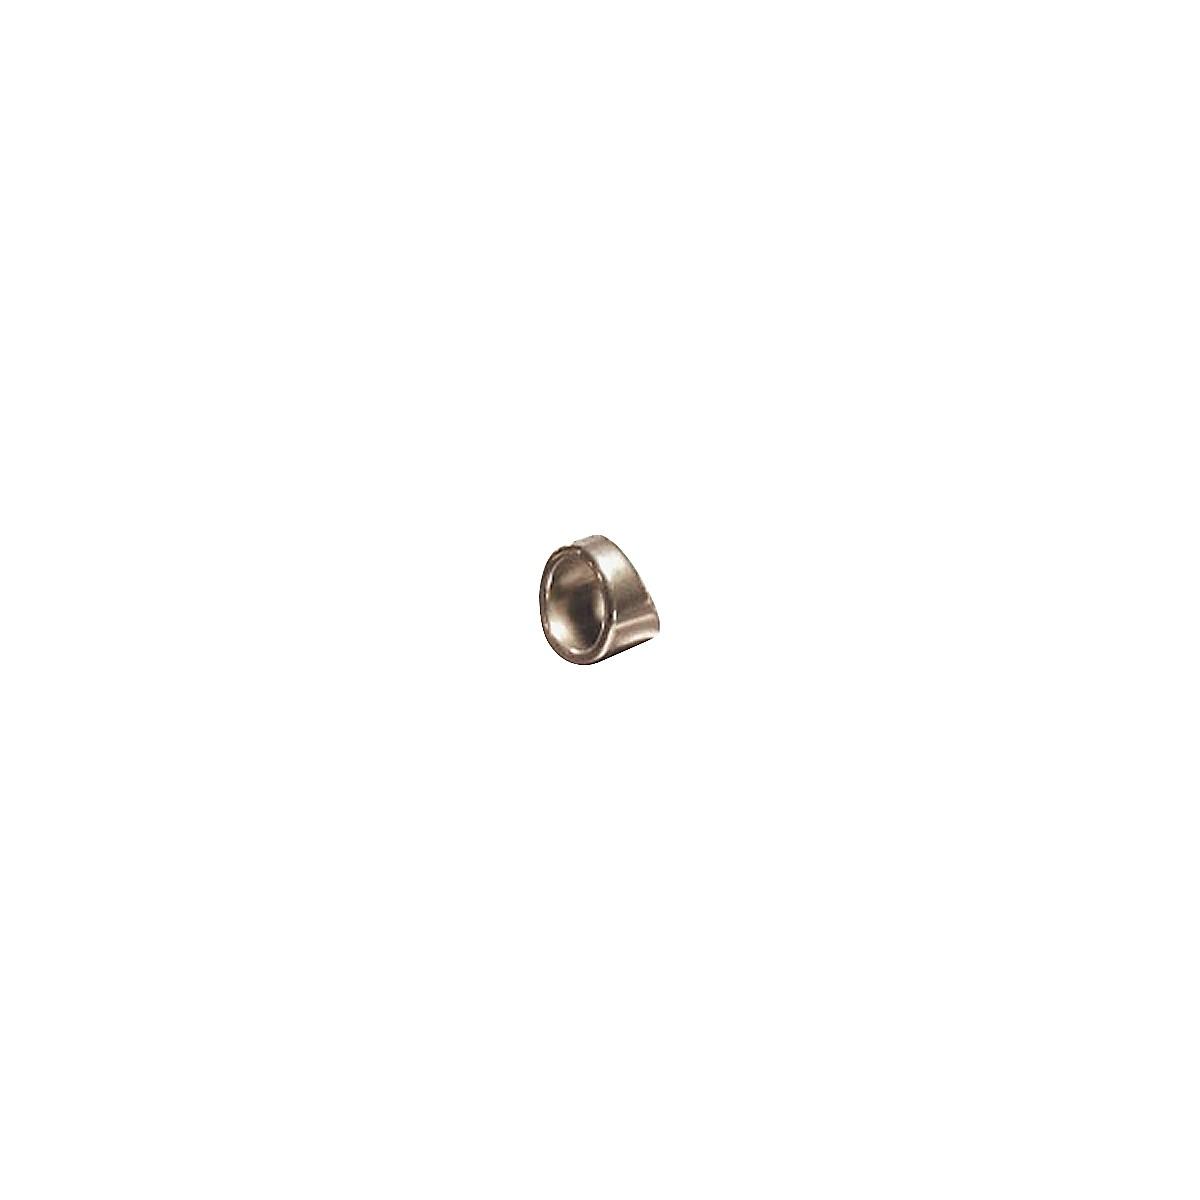 Peaceland Guitar Ring .75in Stainless Steel Guitar Ring Slide